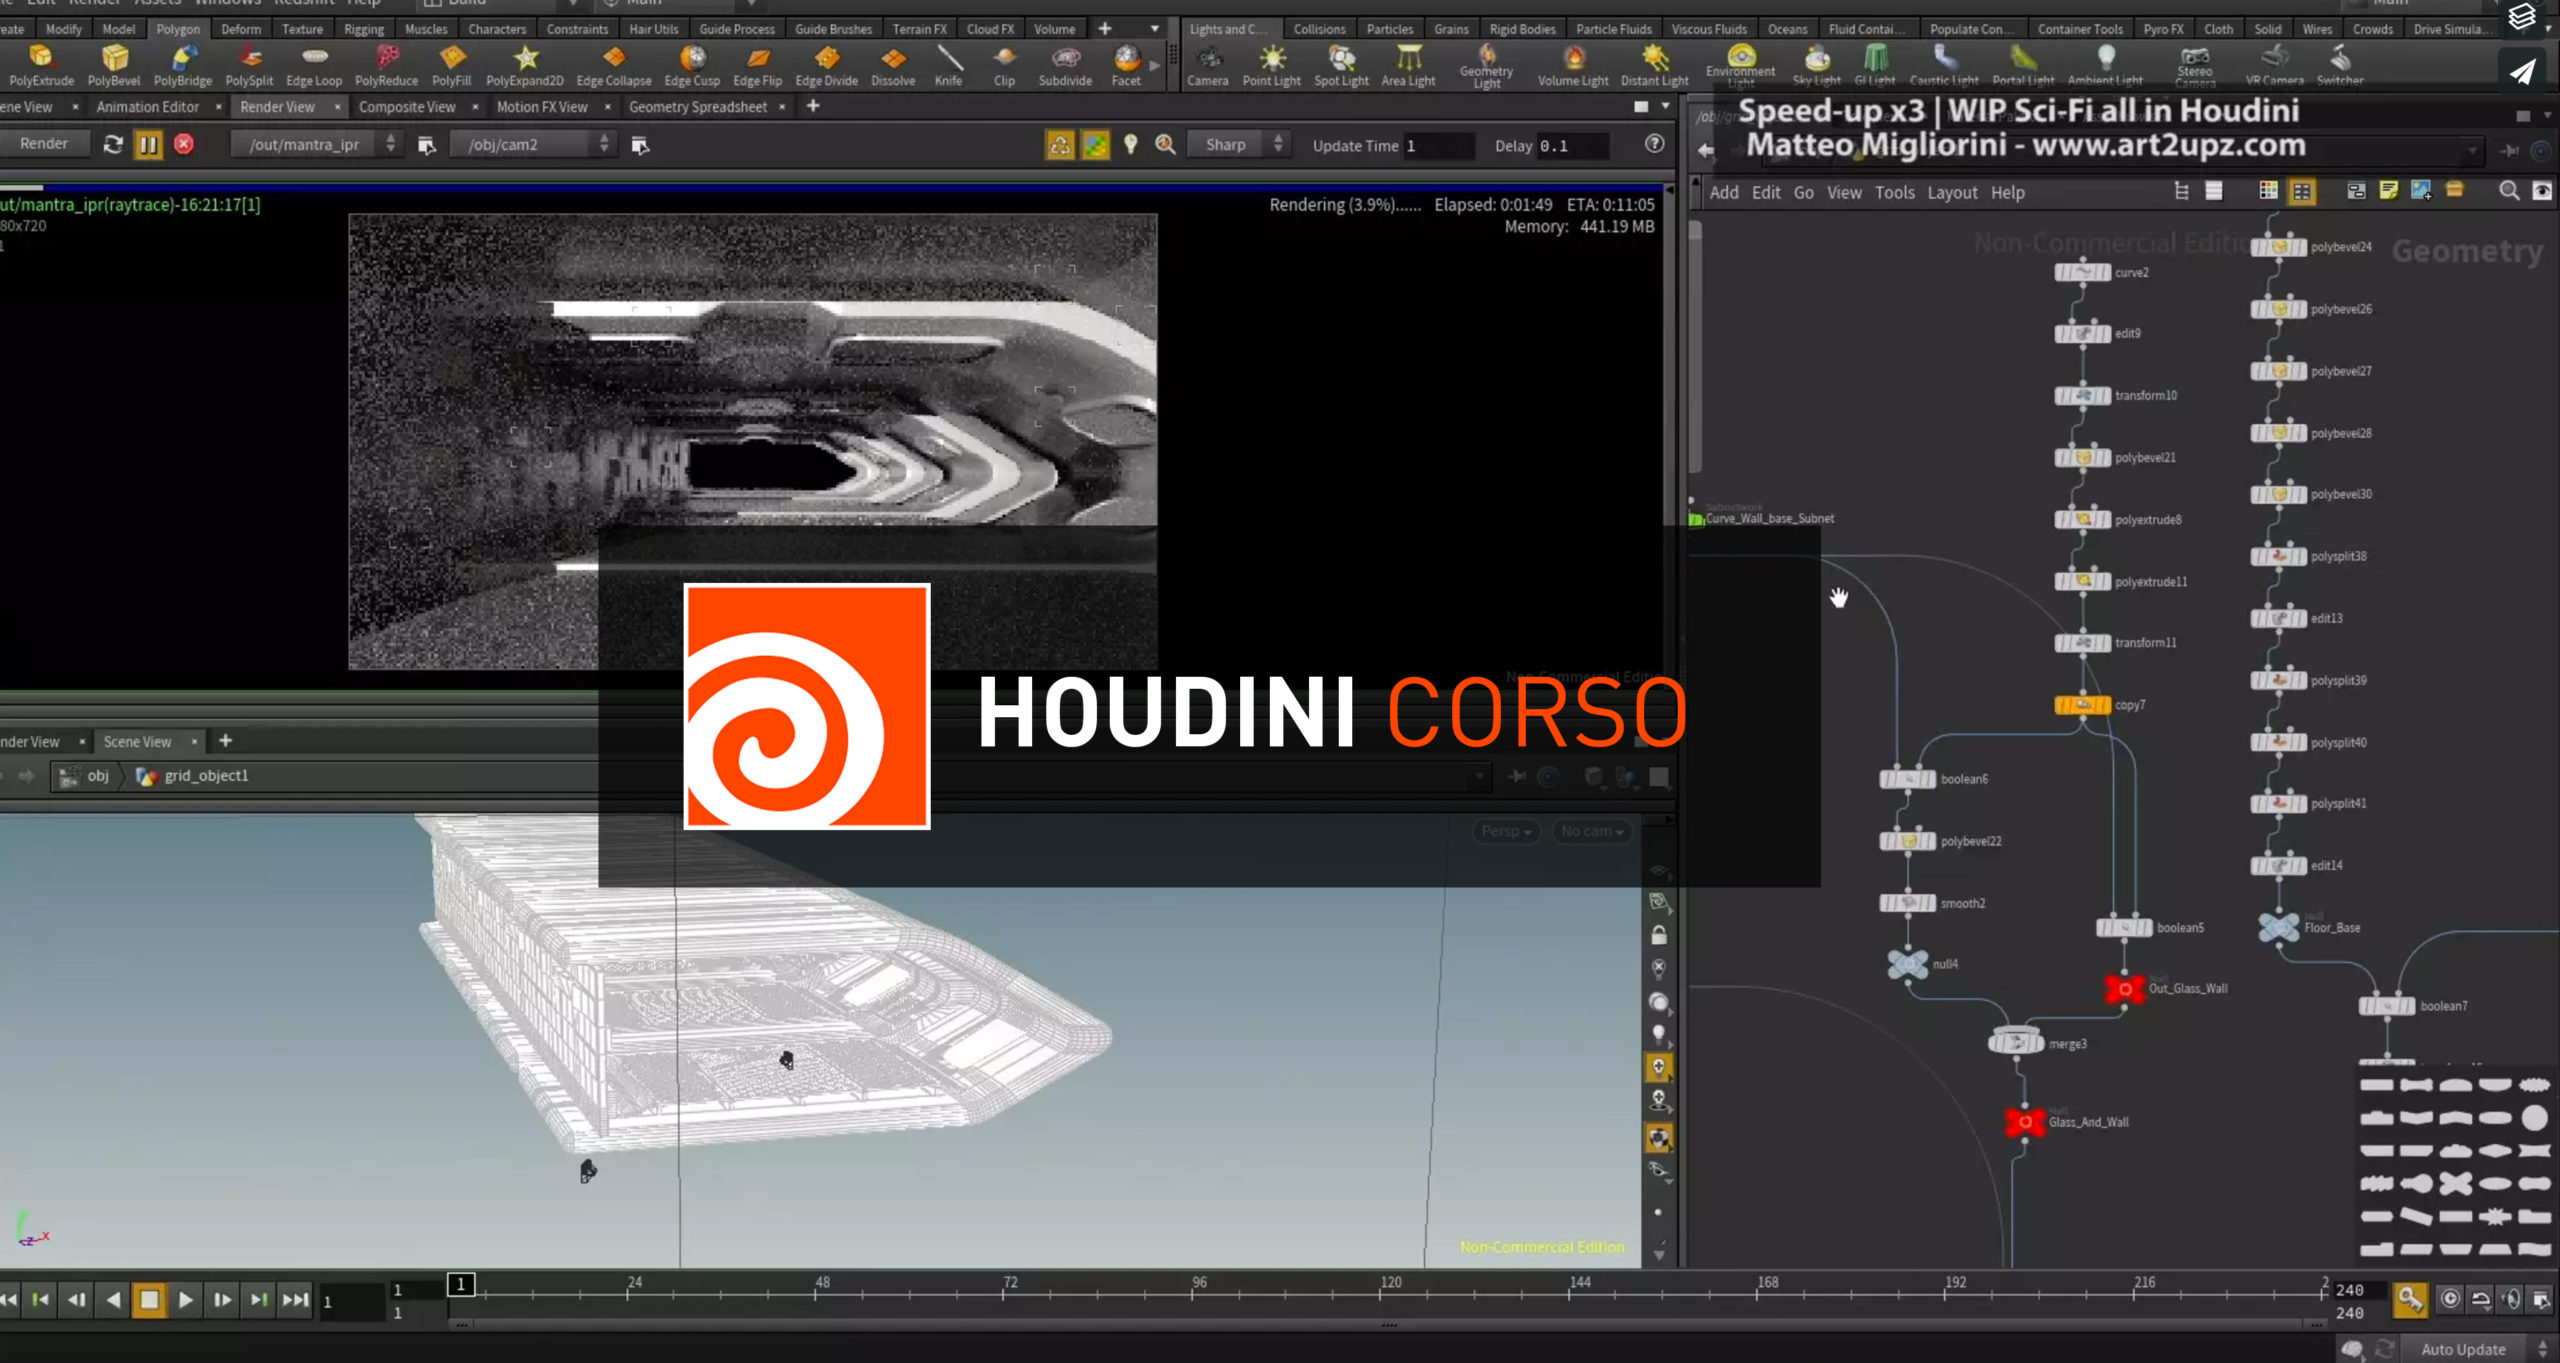 Houdini Courses Video Tutorial 3dart